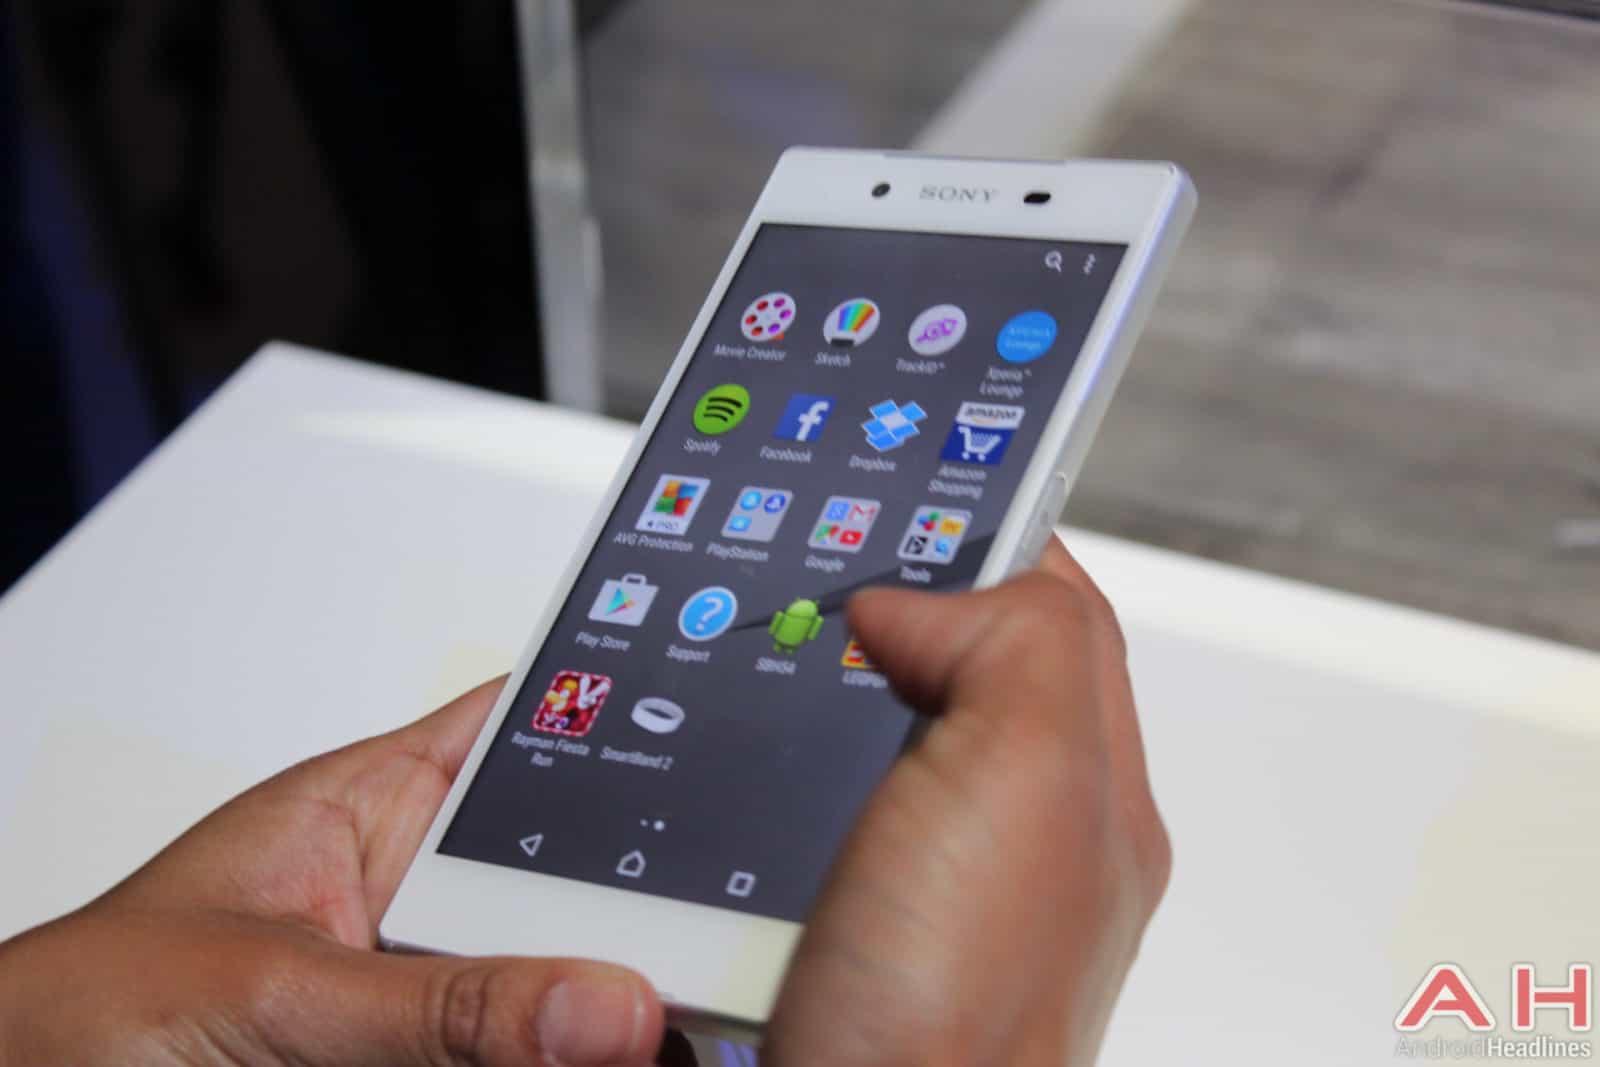 Sony Xperia Z5 IFA AH 3